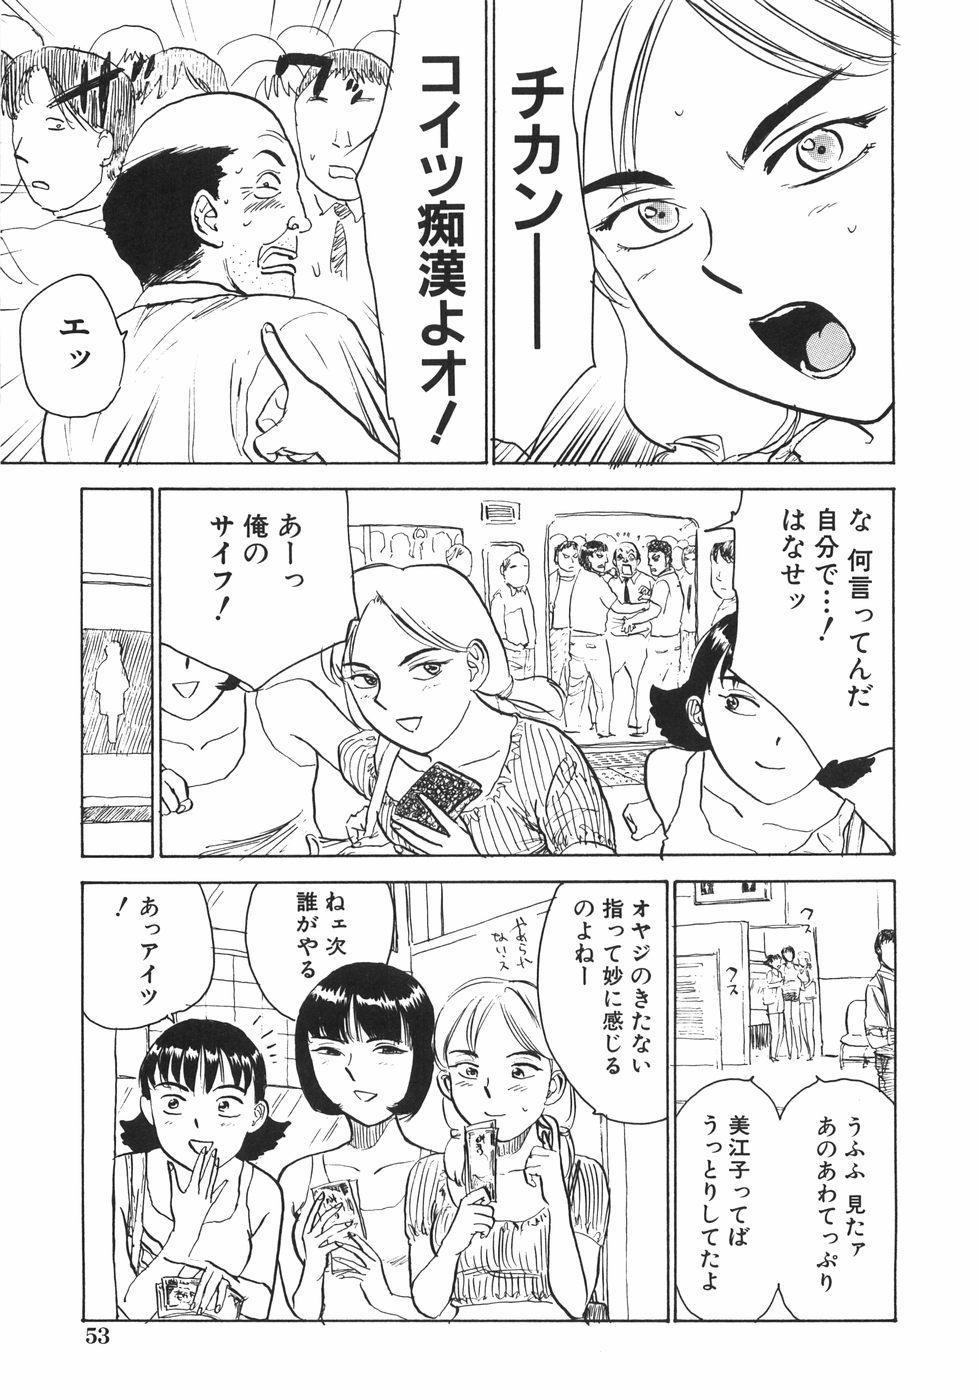 Ningyou no Yakata - The Doll House 59